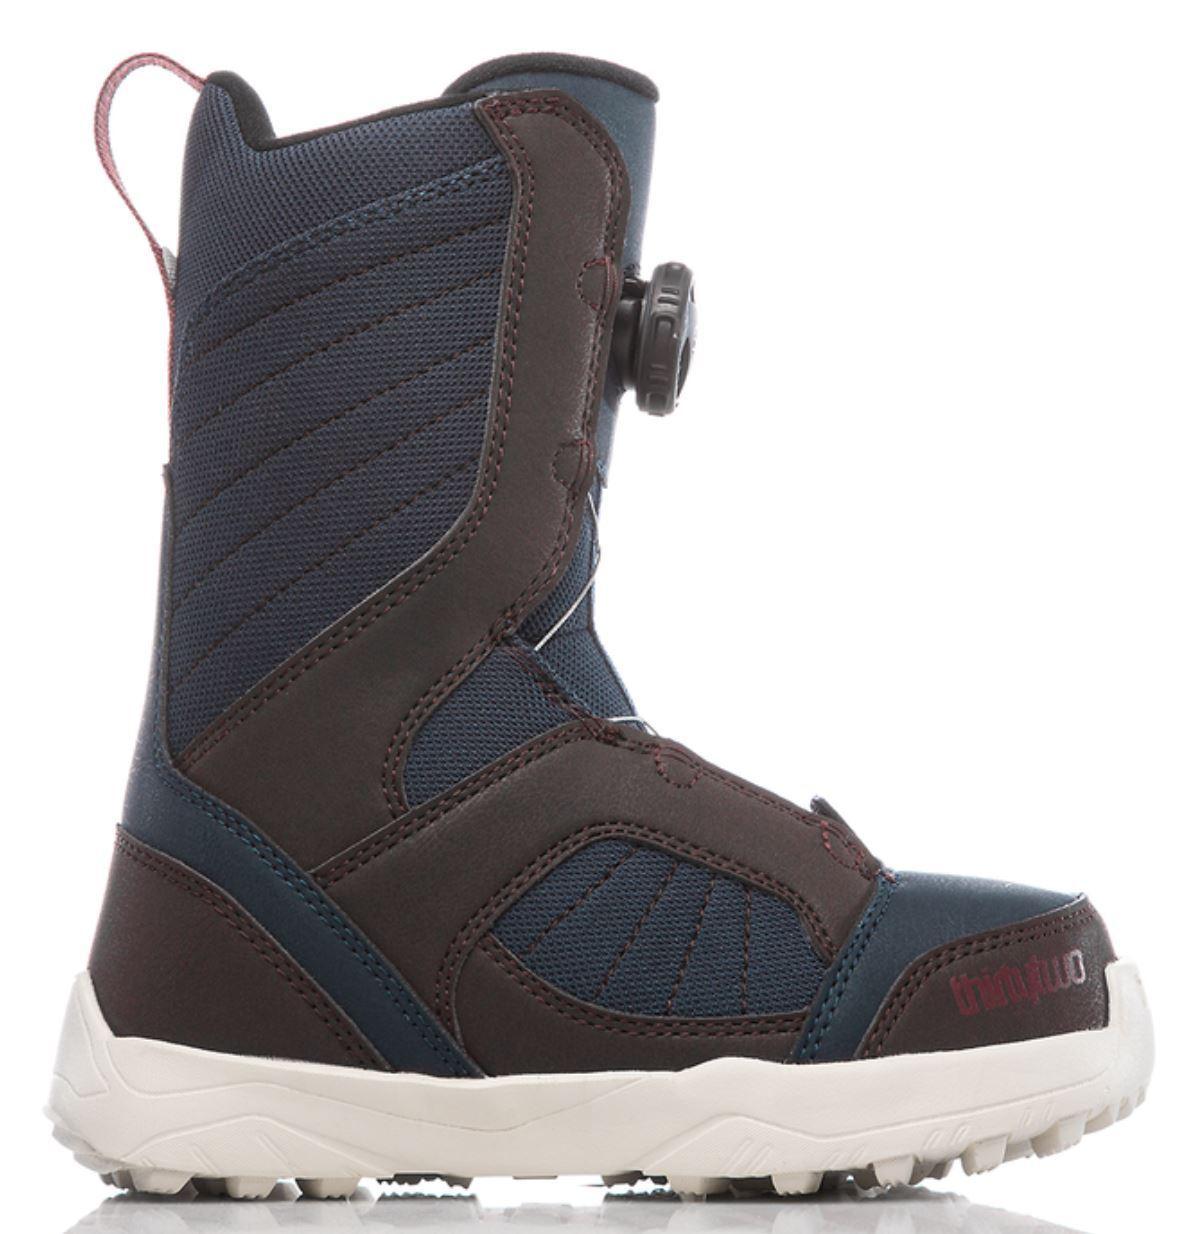 ThirtyTwo BOA Kids Soft Flex Snowboard Boots 2C  Brown Navy NIB  online shopping and fashion store